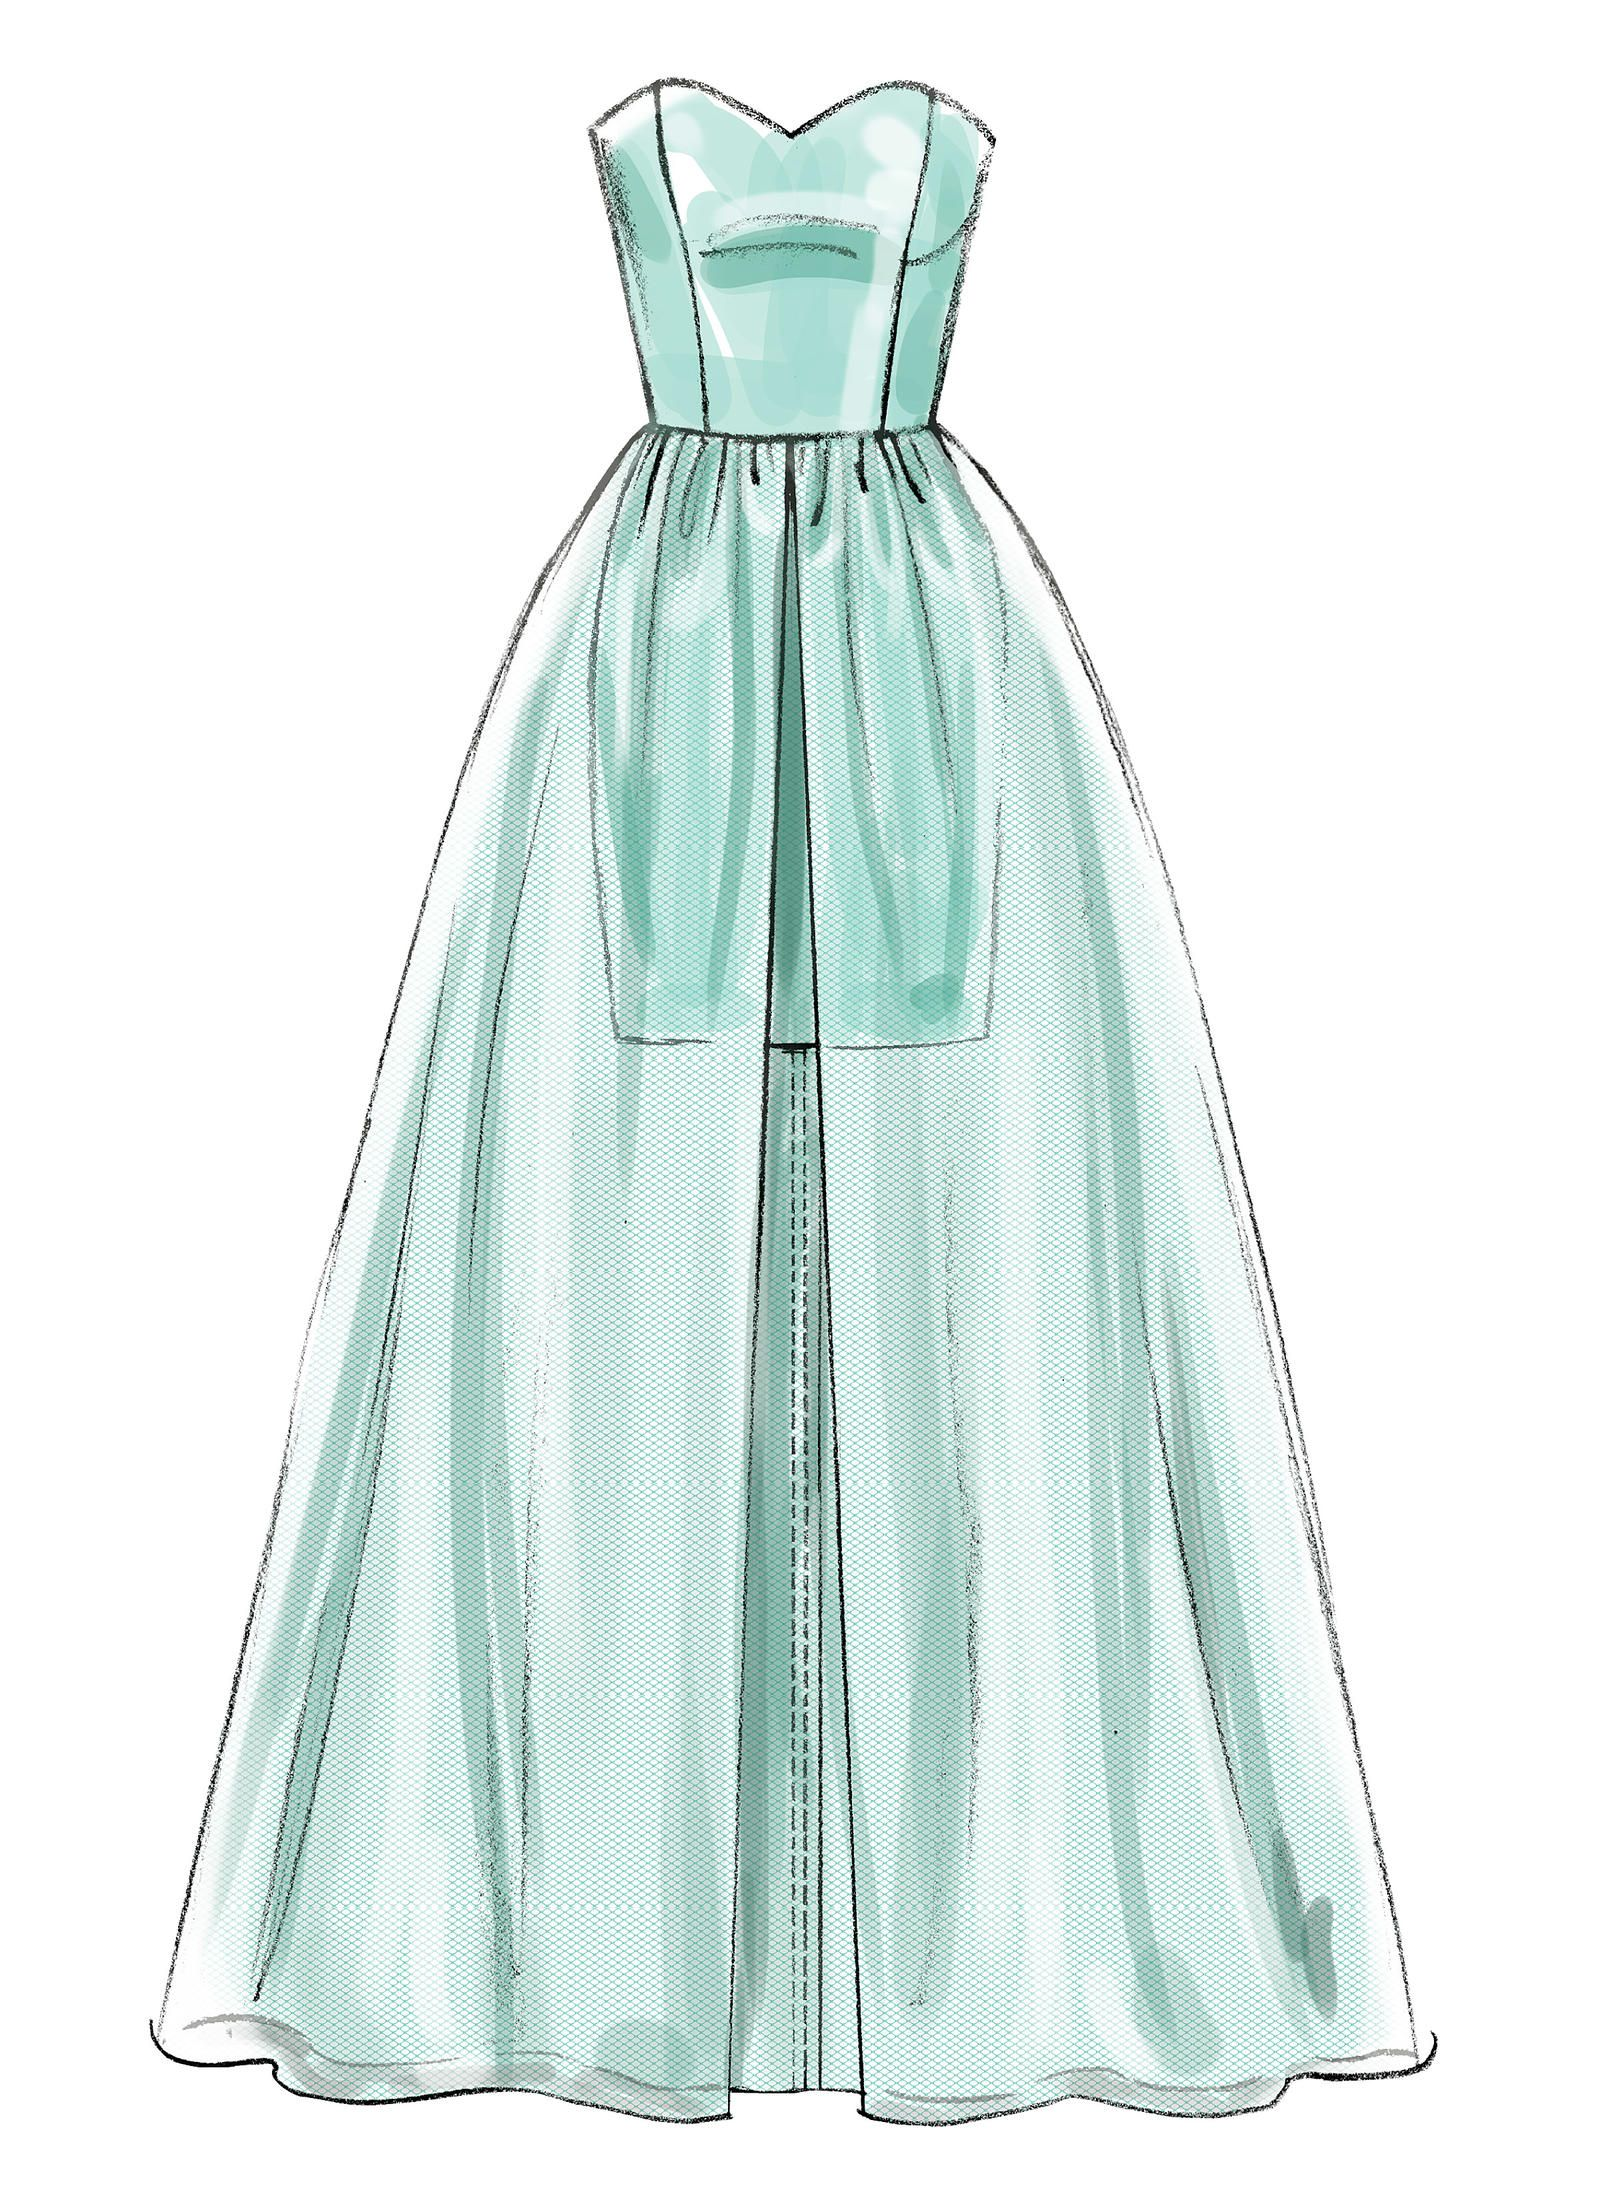 Pin by Janice Kinnamon on prom | Pinterest | Fashion illustrations ...